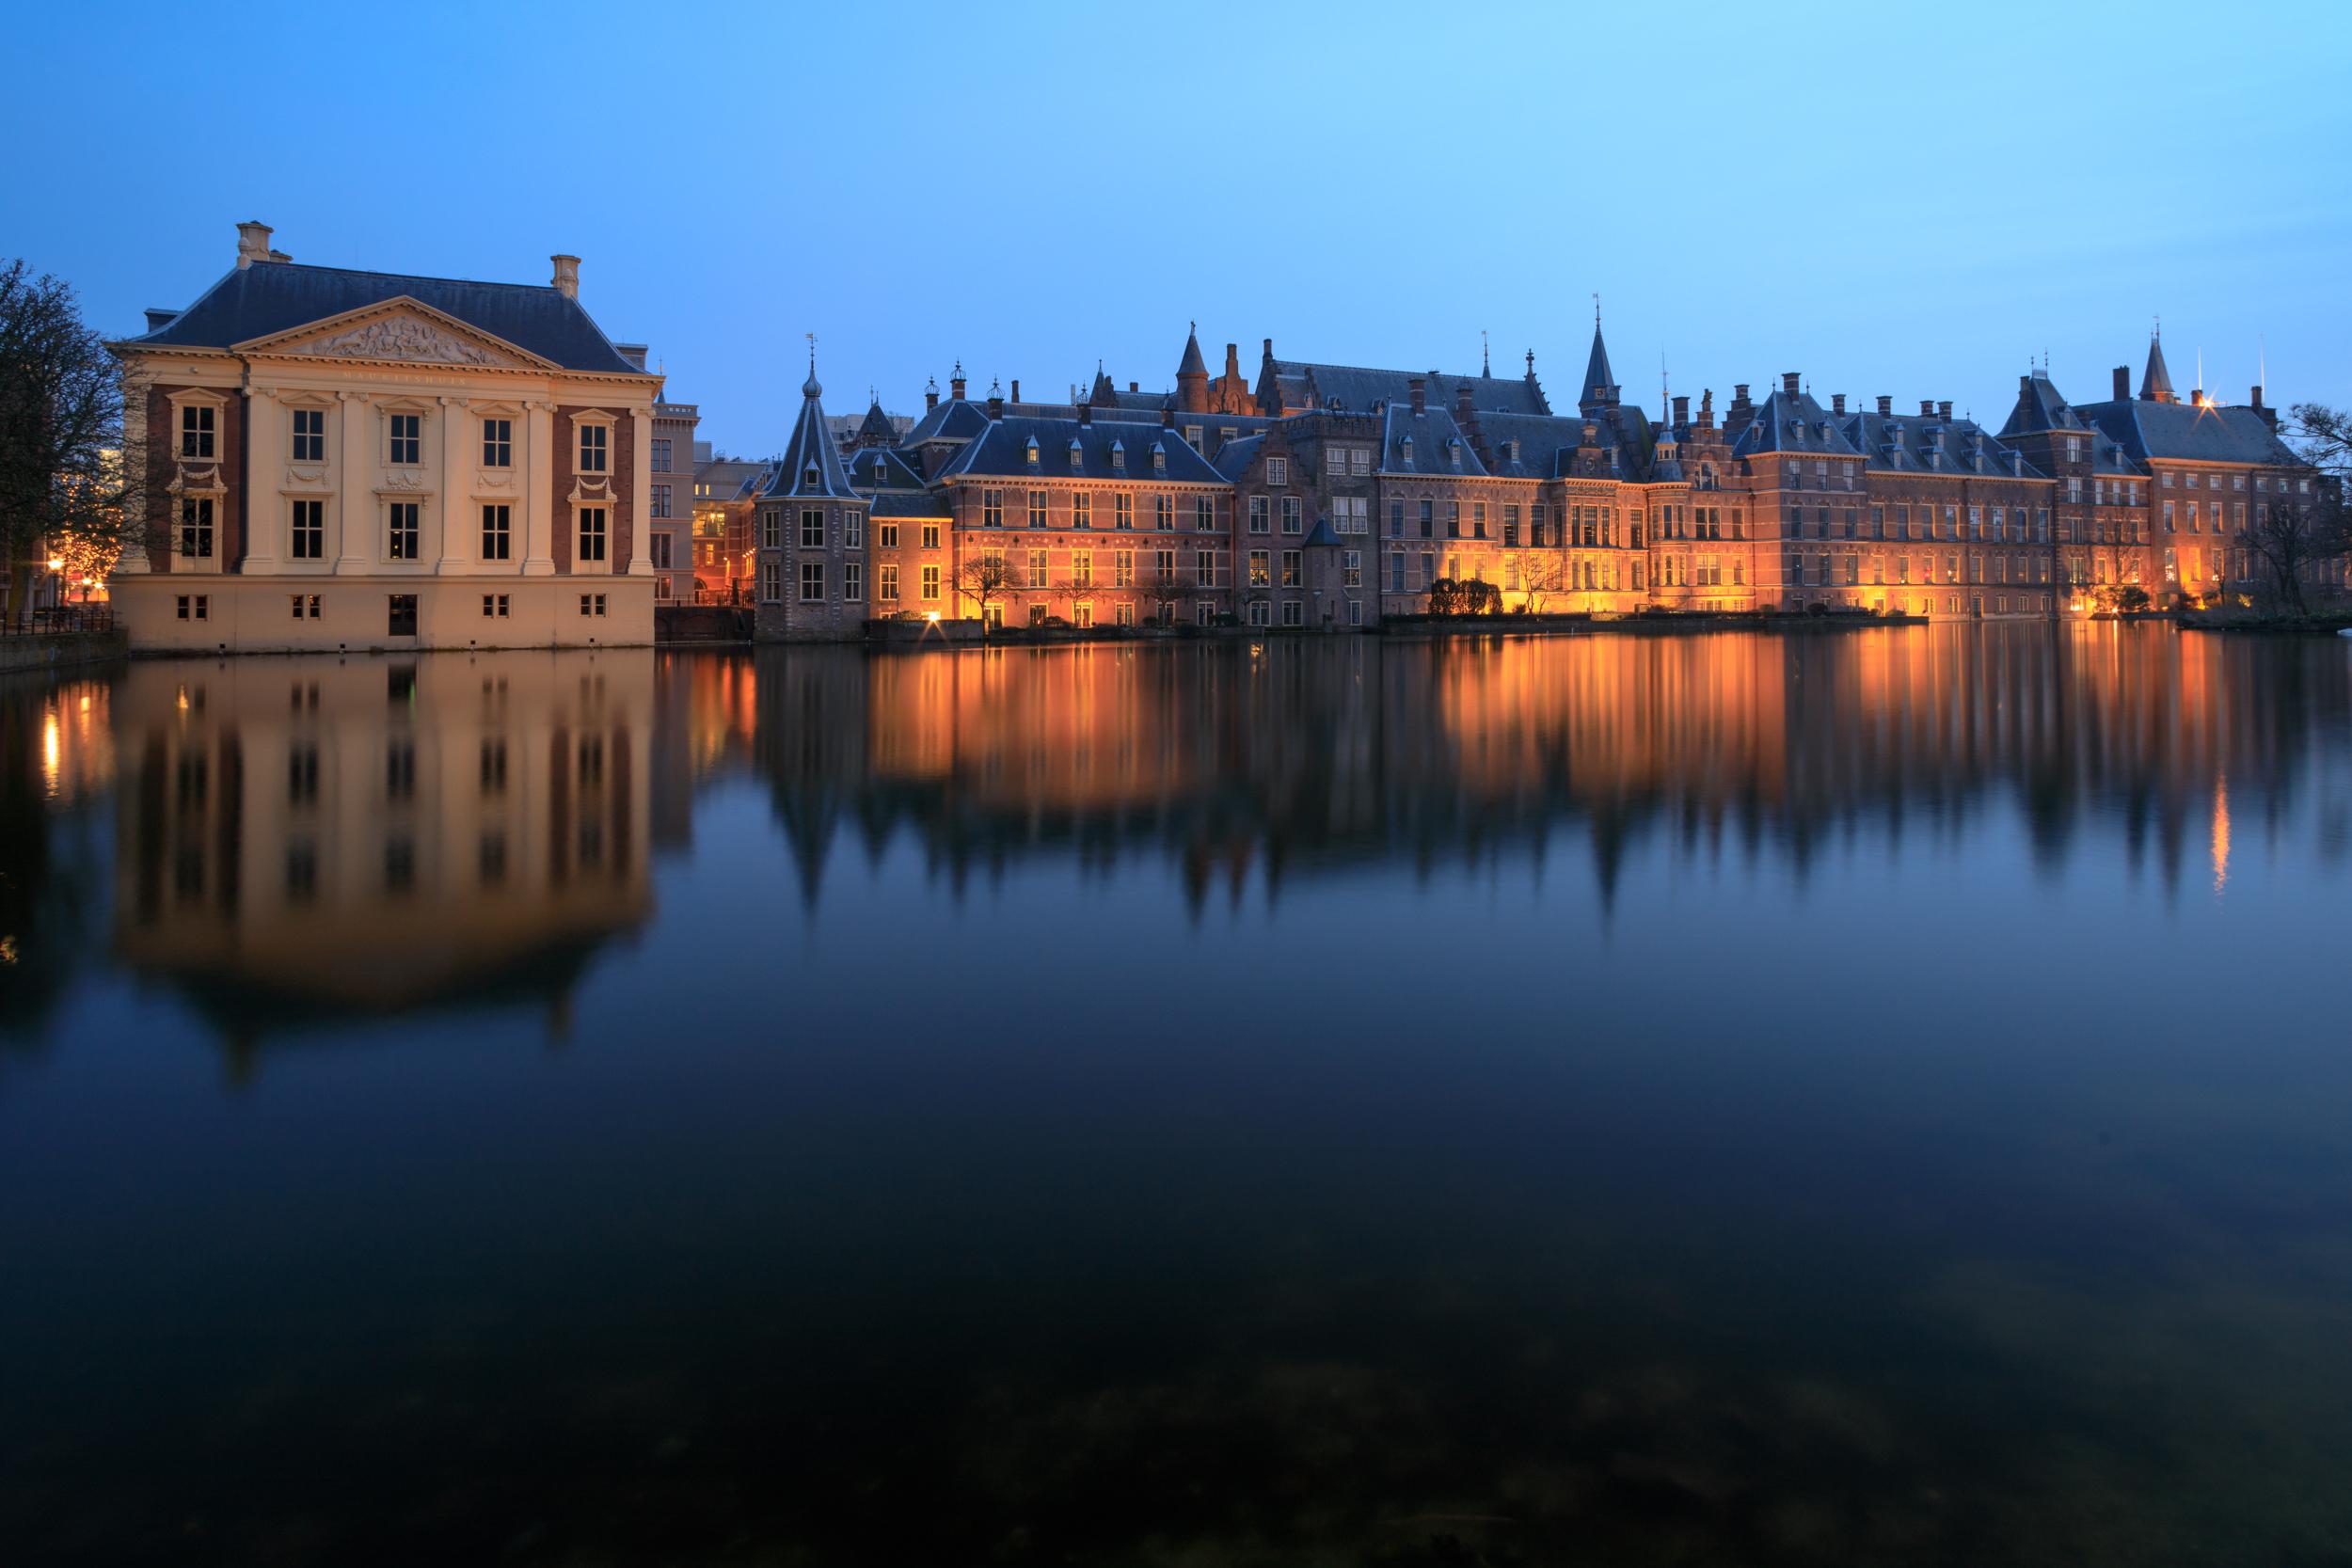 Hofvijver | Binnenhof | 't Torentje | Mauritshuis-4.jpg